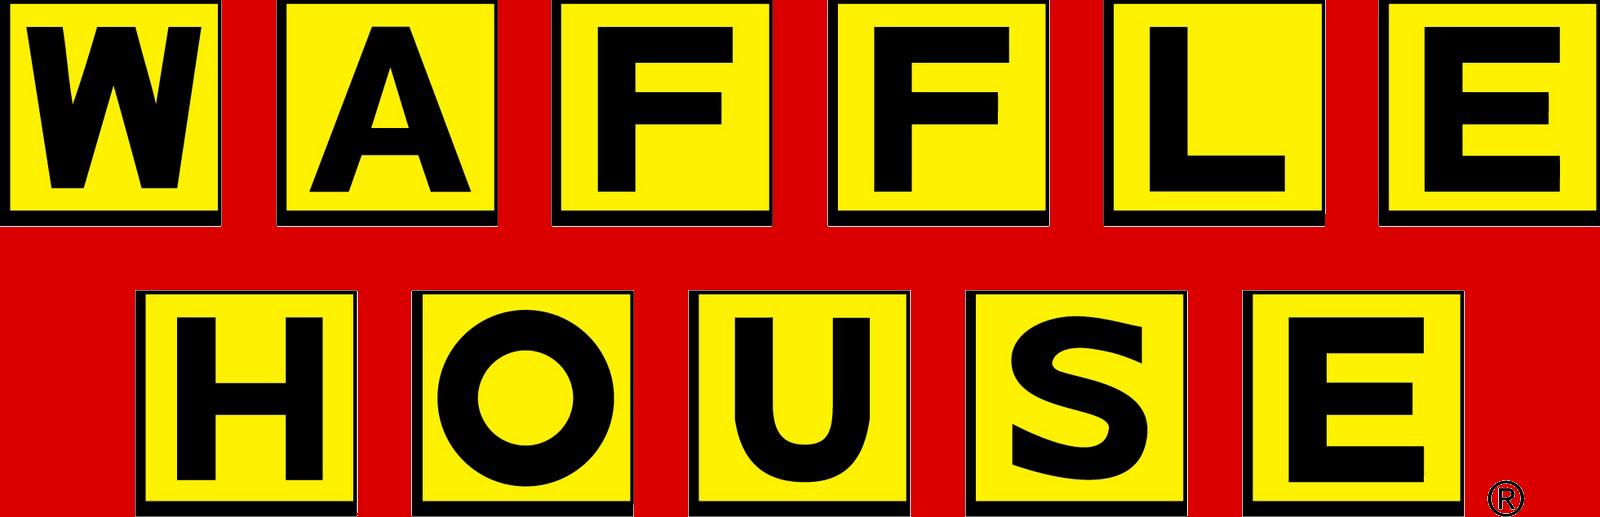 Waffle clipart waffle bar. House good food fast